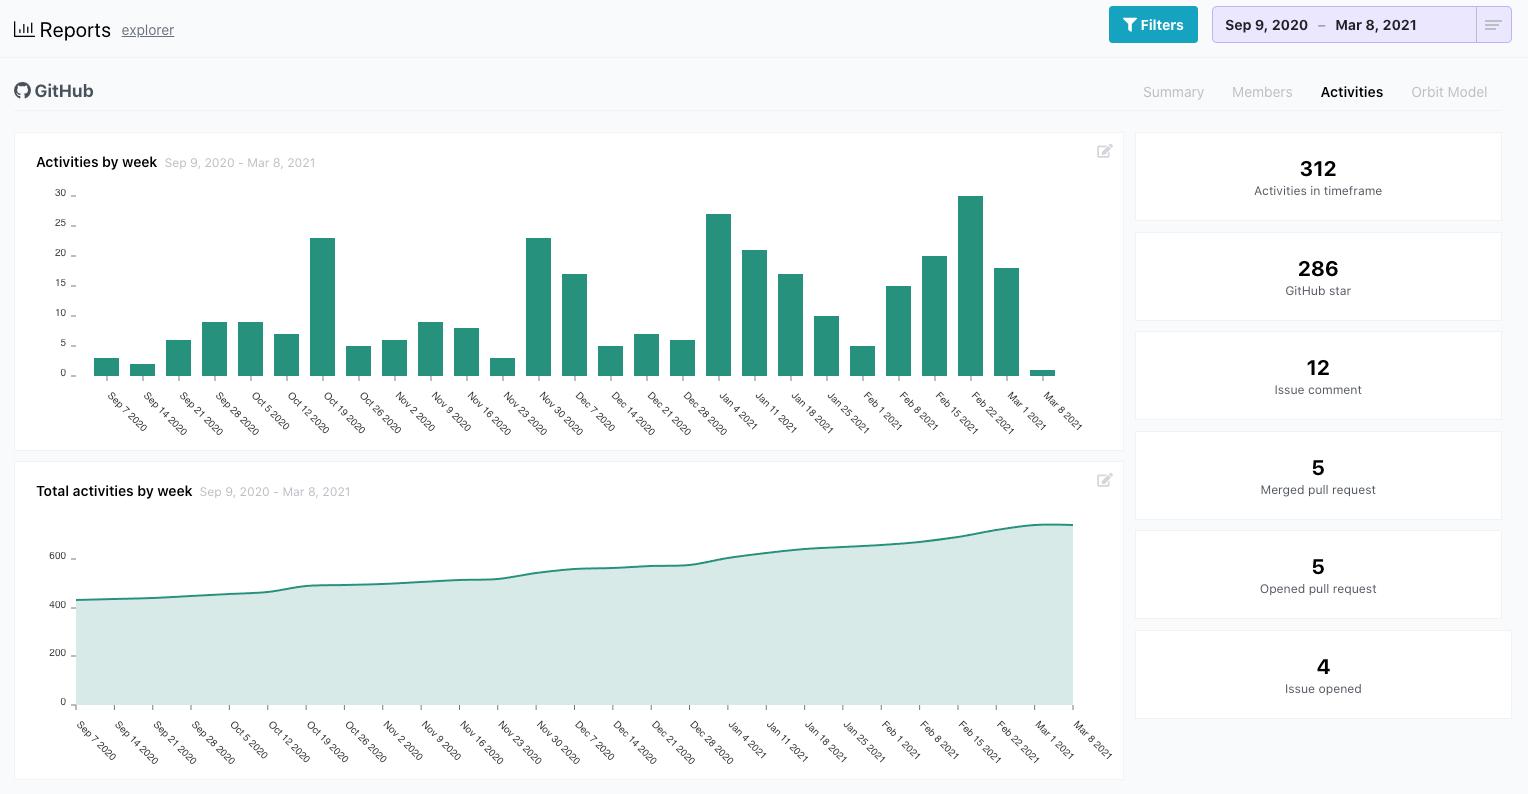 Screenshot of charts showing GitHub activities over time